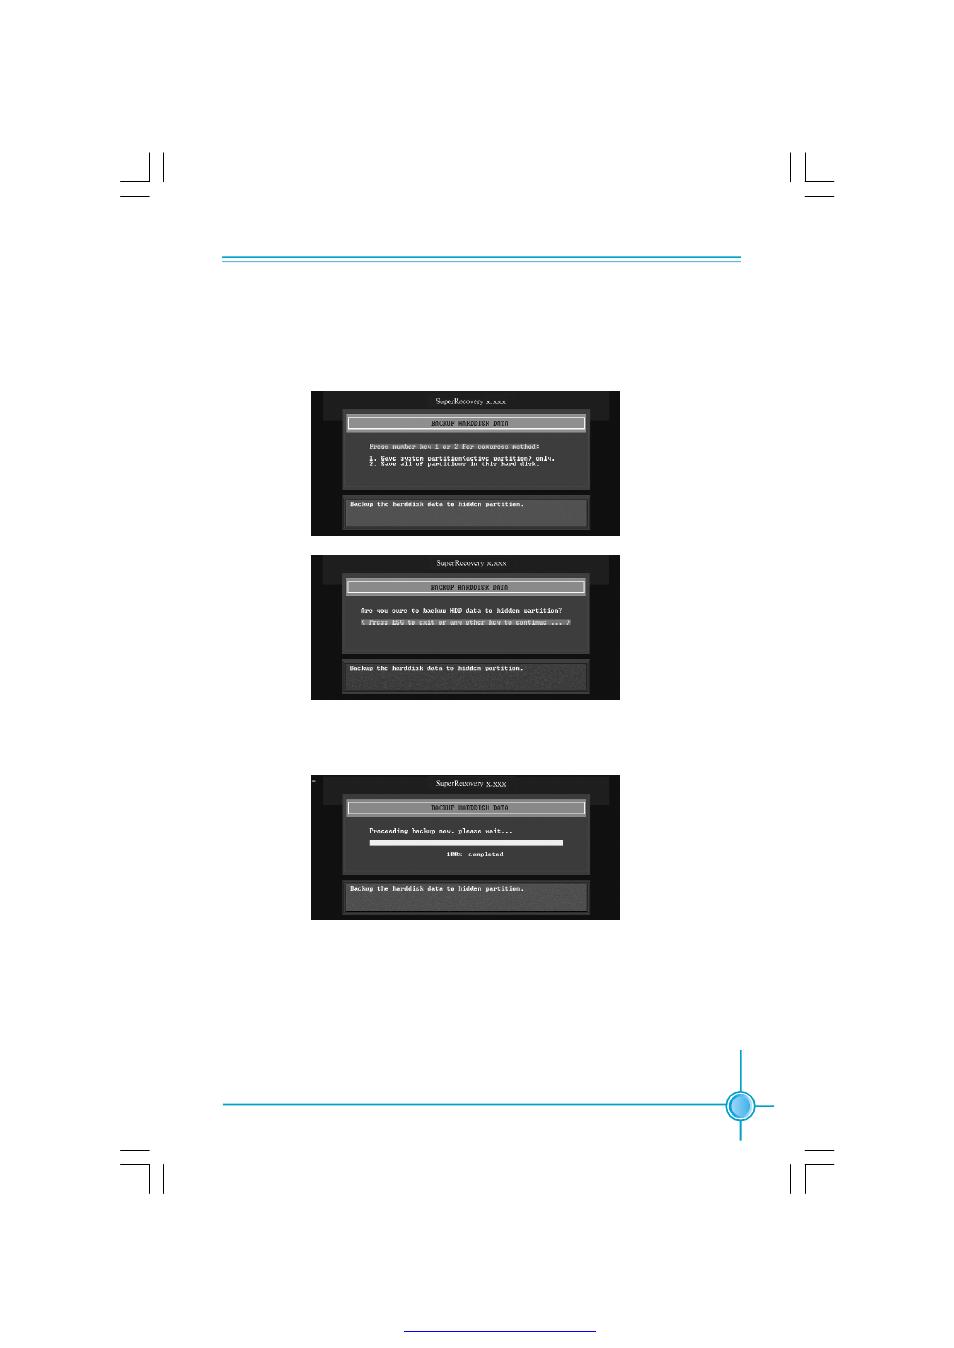 booker array - foxconn 661fx7mi manual pdf rh maan life